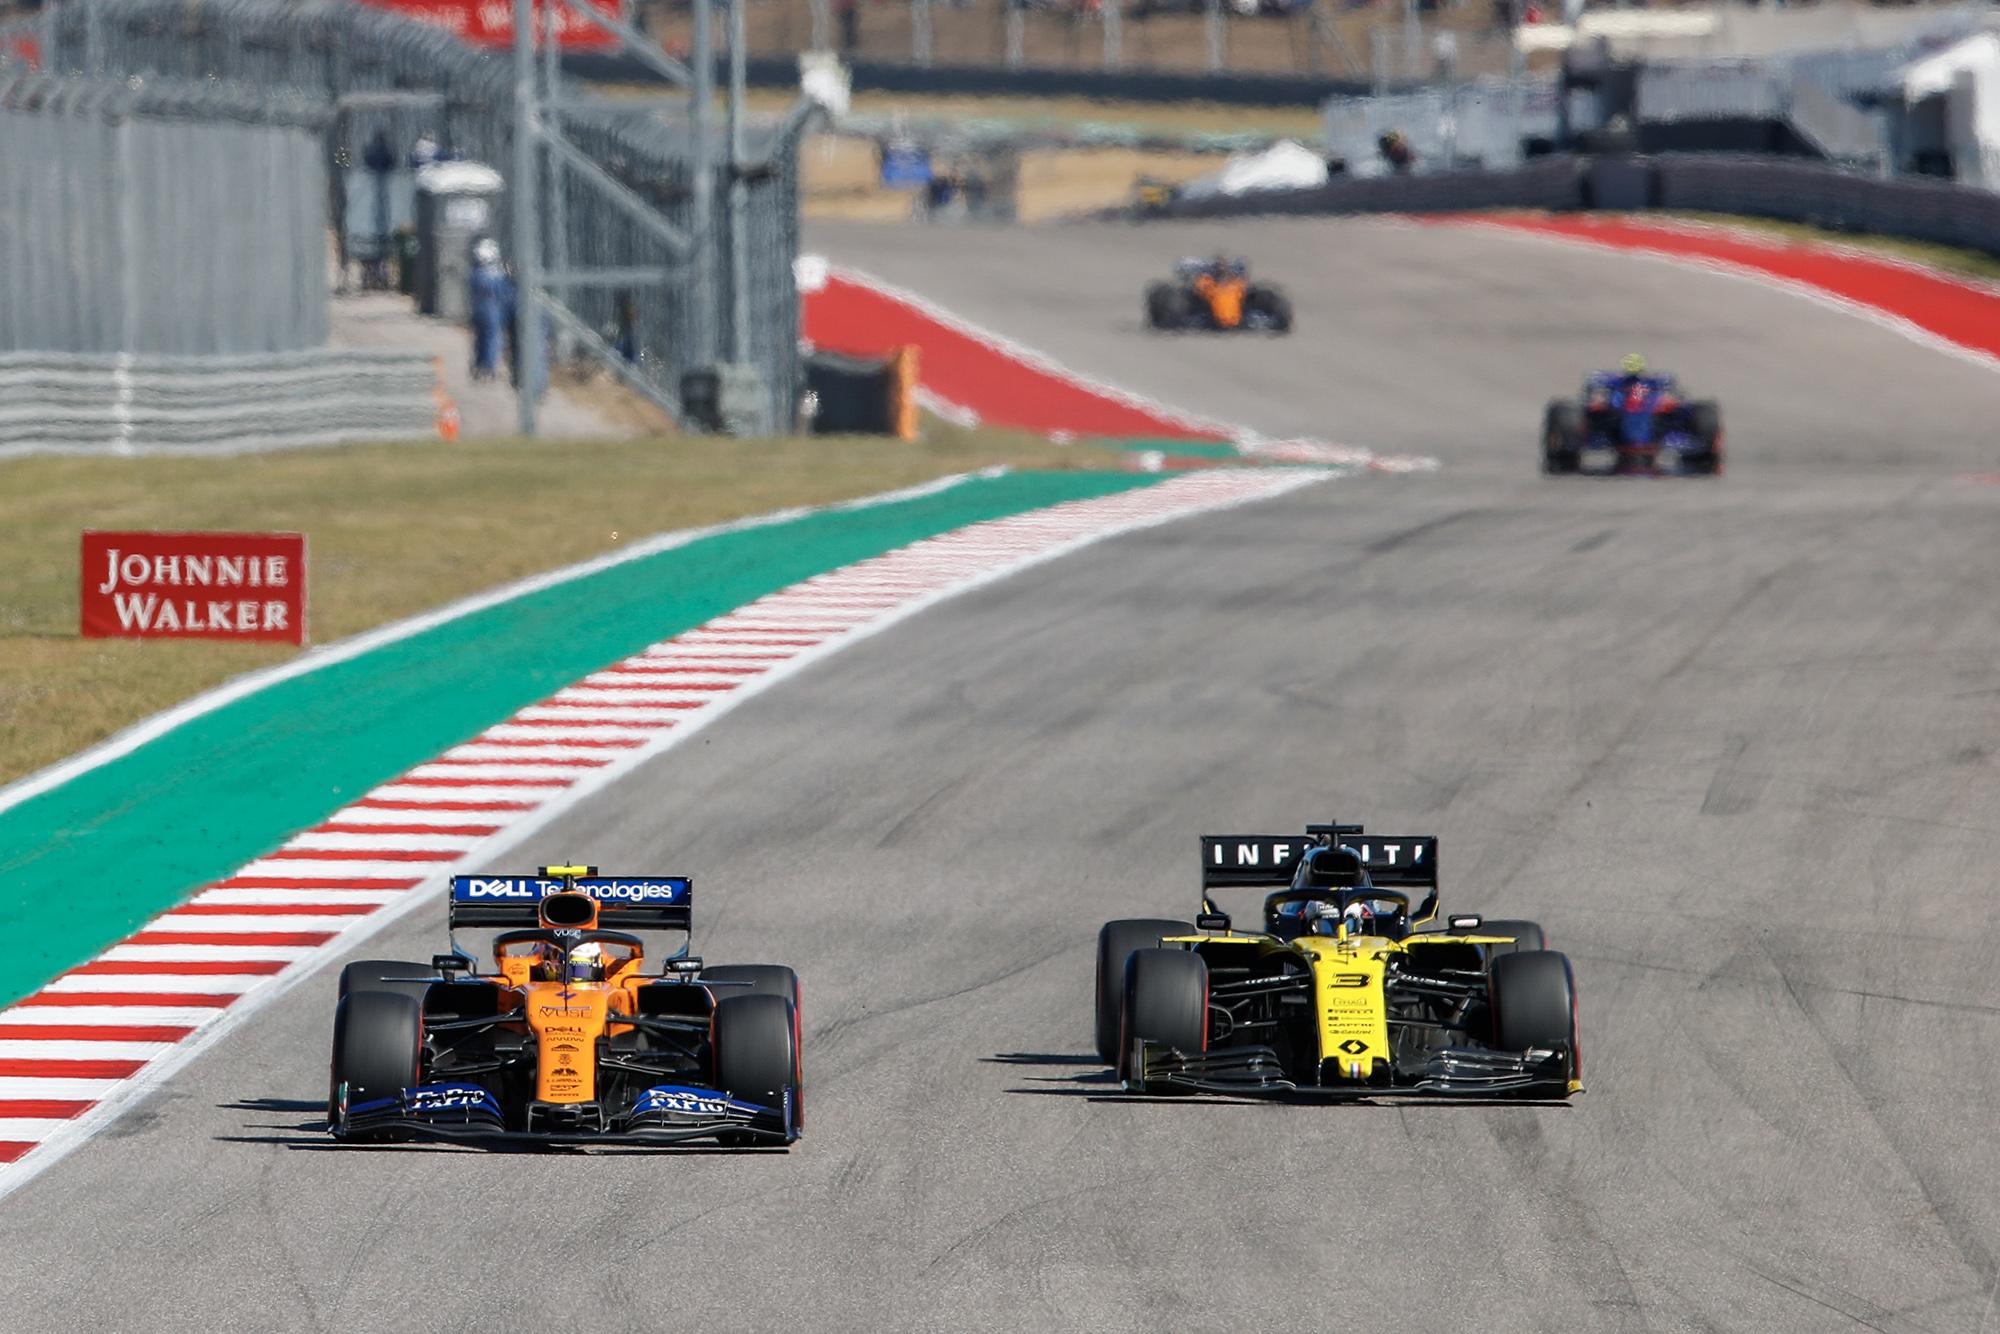 Lando Norris and Daniel Ricciardo side by side during the 2019 US Grand Prix